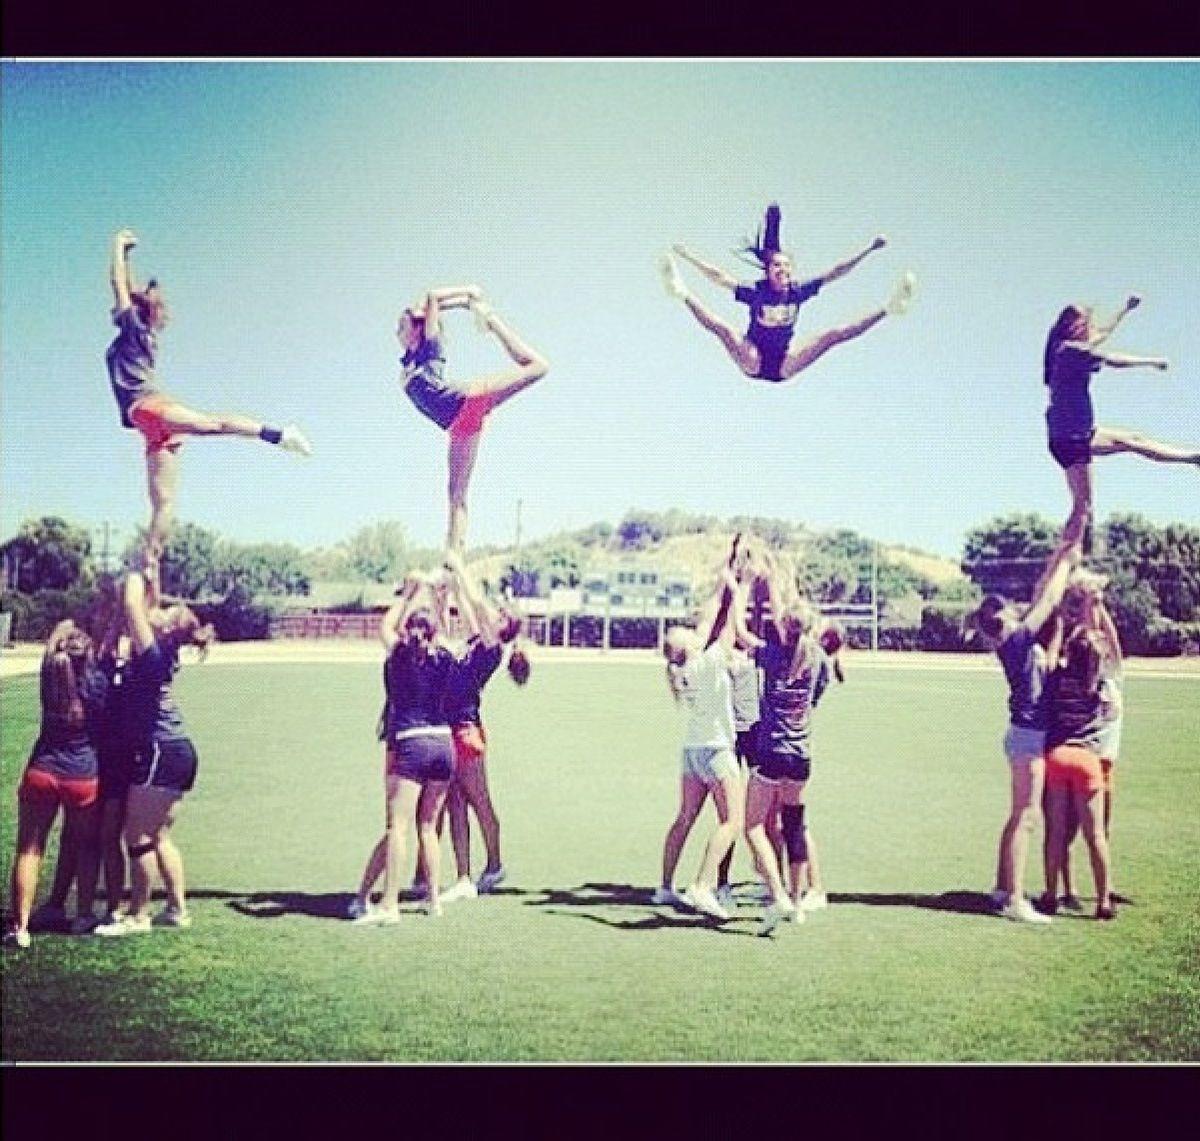 My cheerleading team